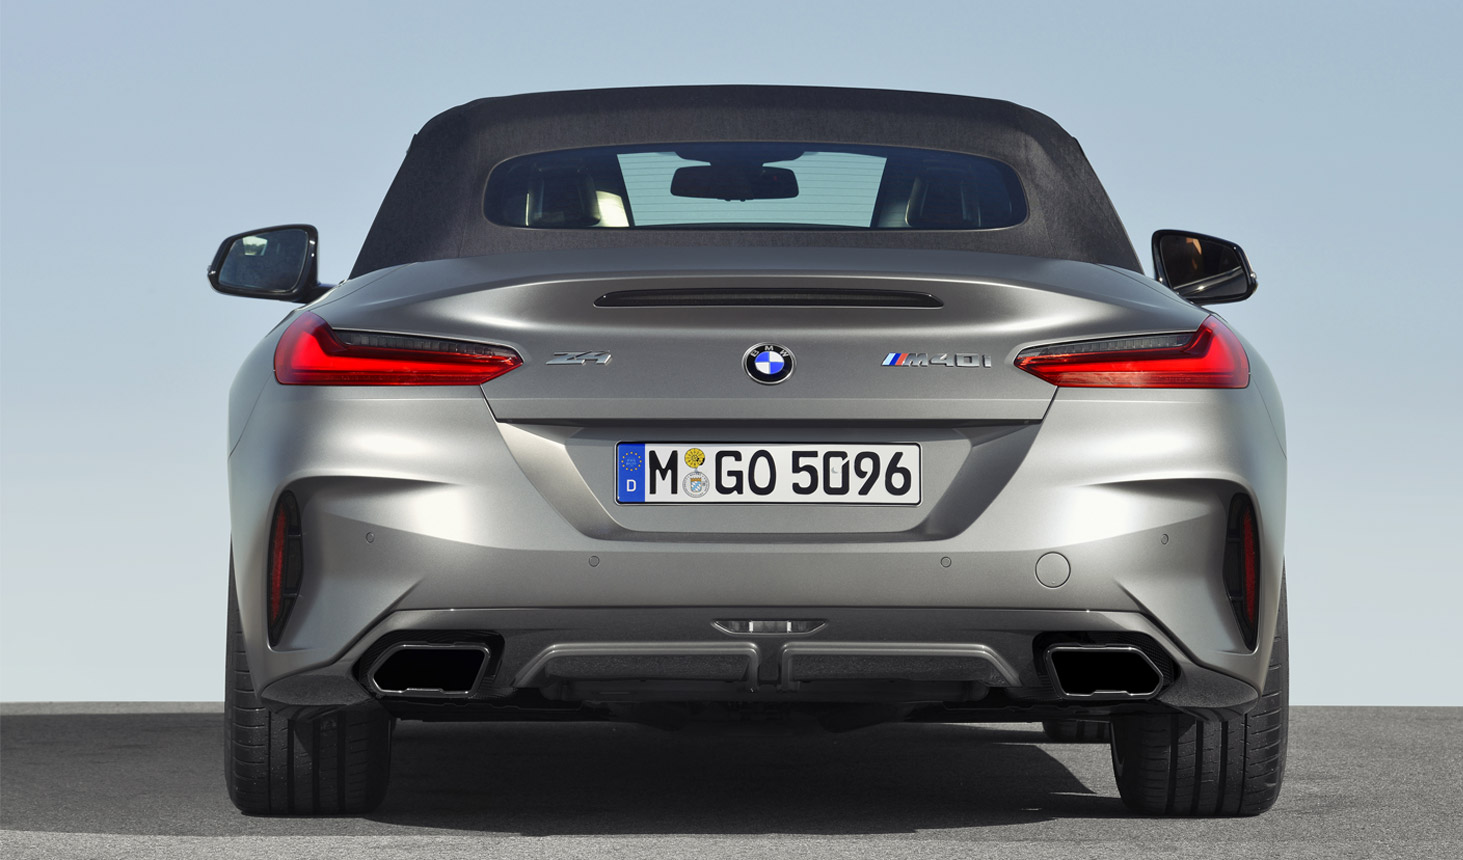 6-fiche-occasion-BMW-Z4-G29-fiabilite-guide-achat.jpg